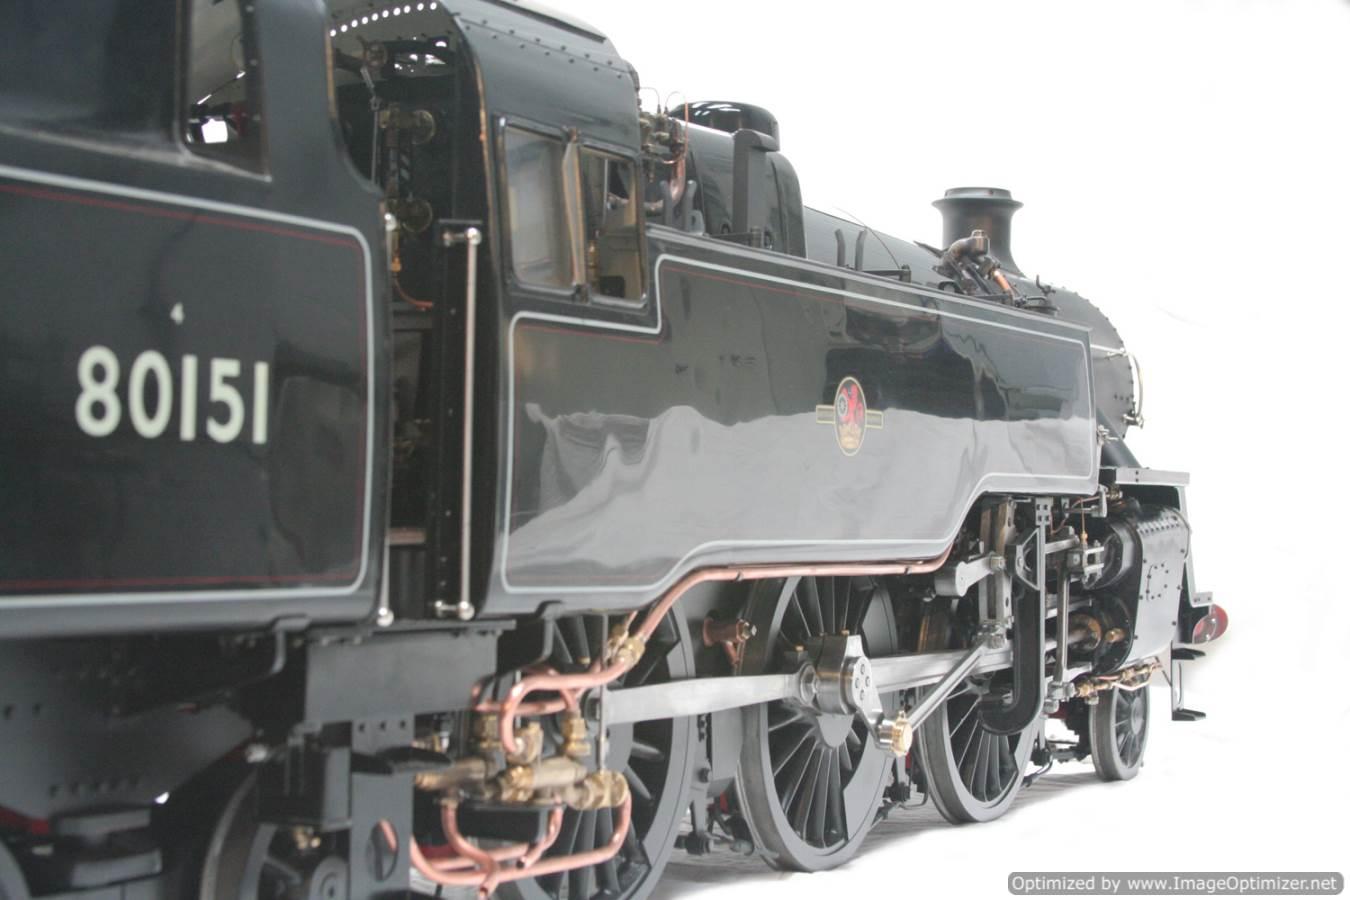 test br-standard-class-4-tank-live-steam-model-steam-workshop-rebuild-34-optimized